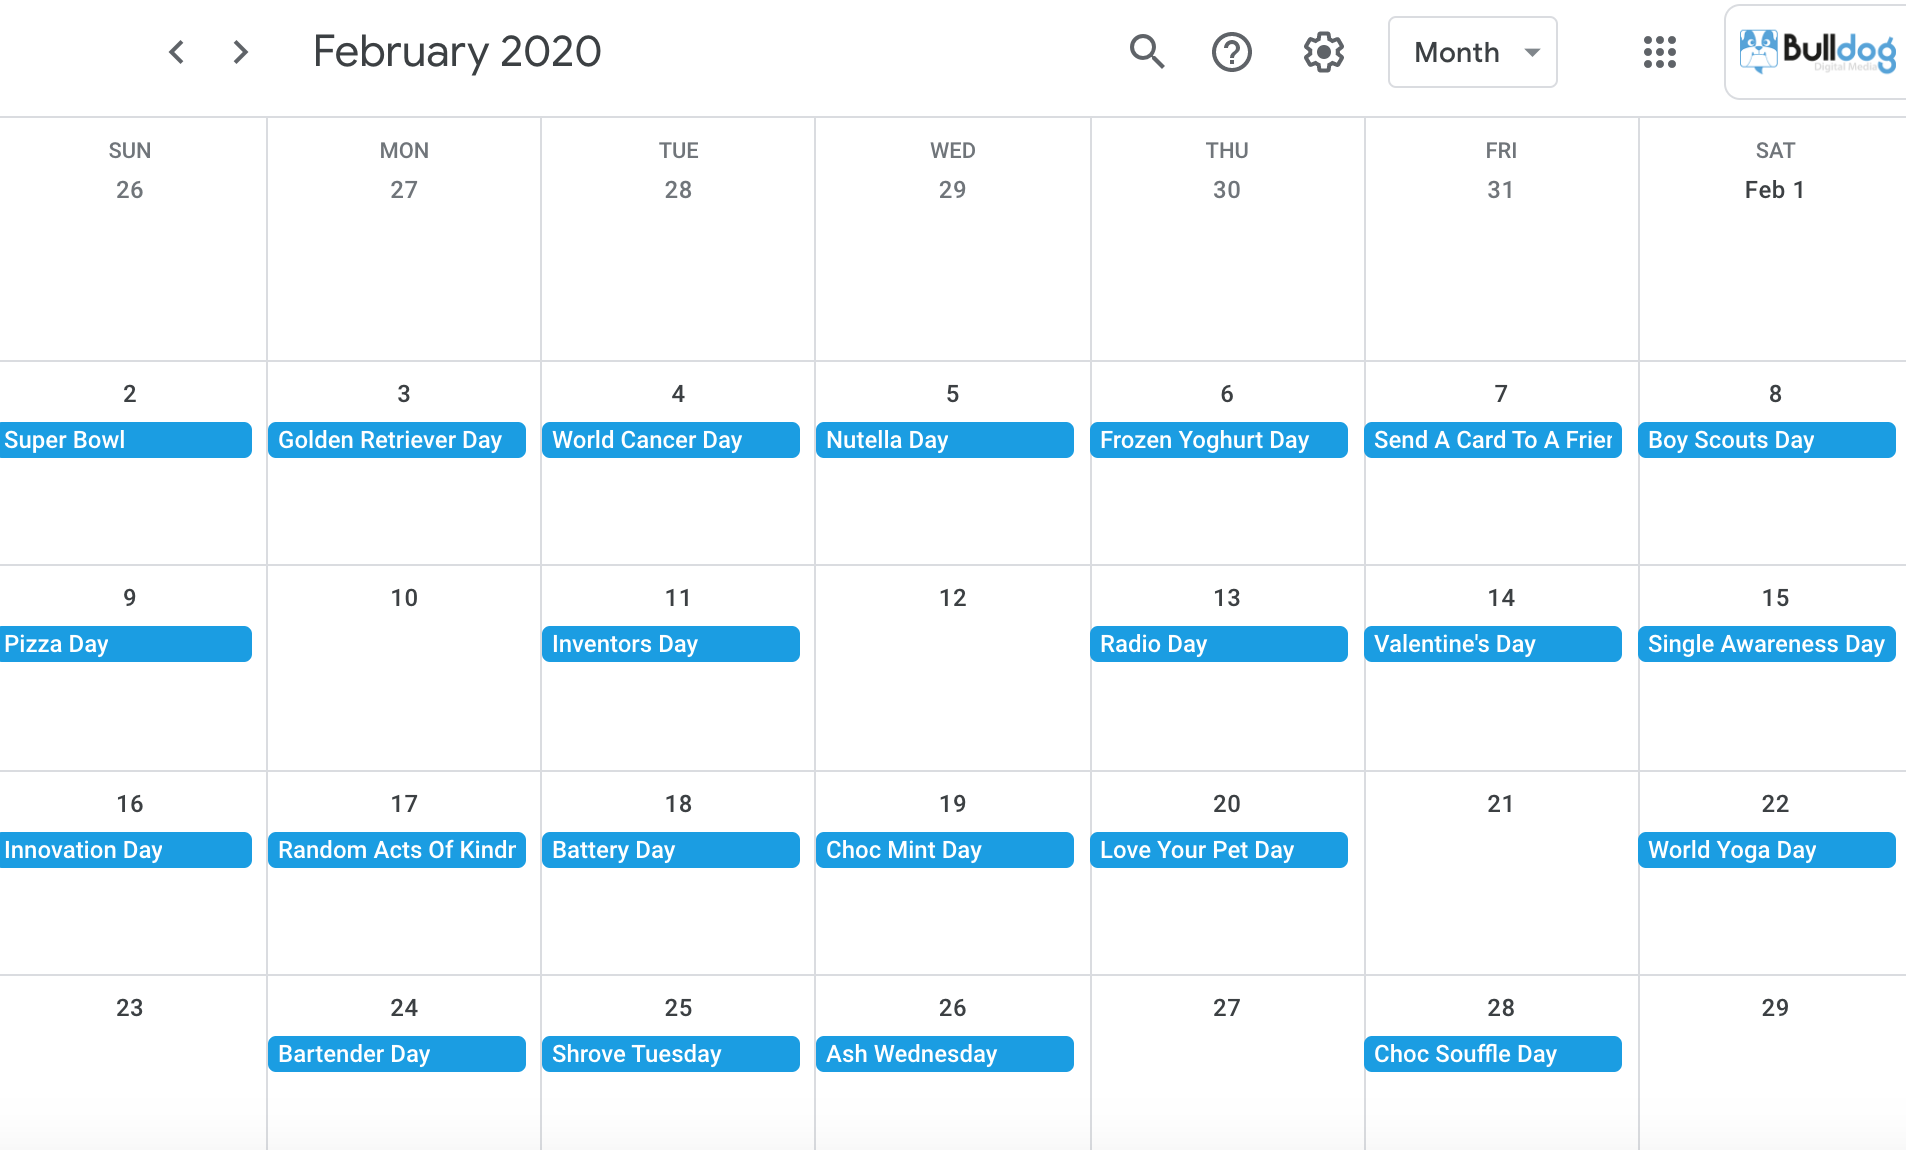 February 2020 social media holidays calendar